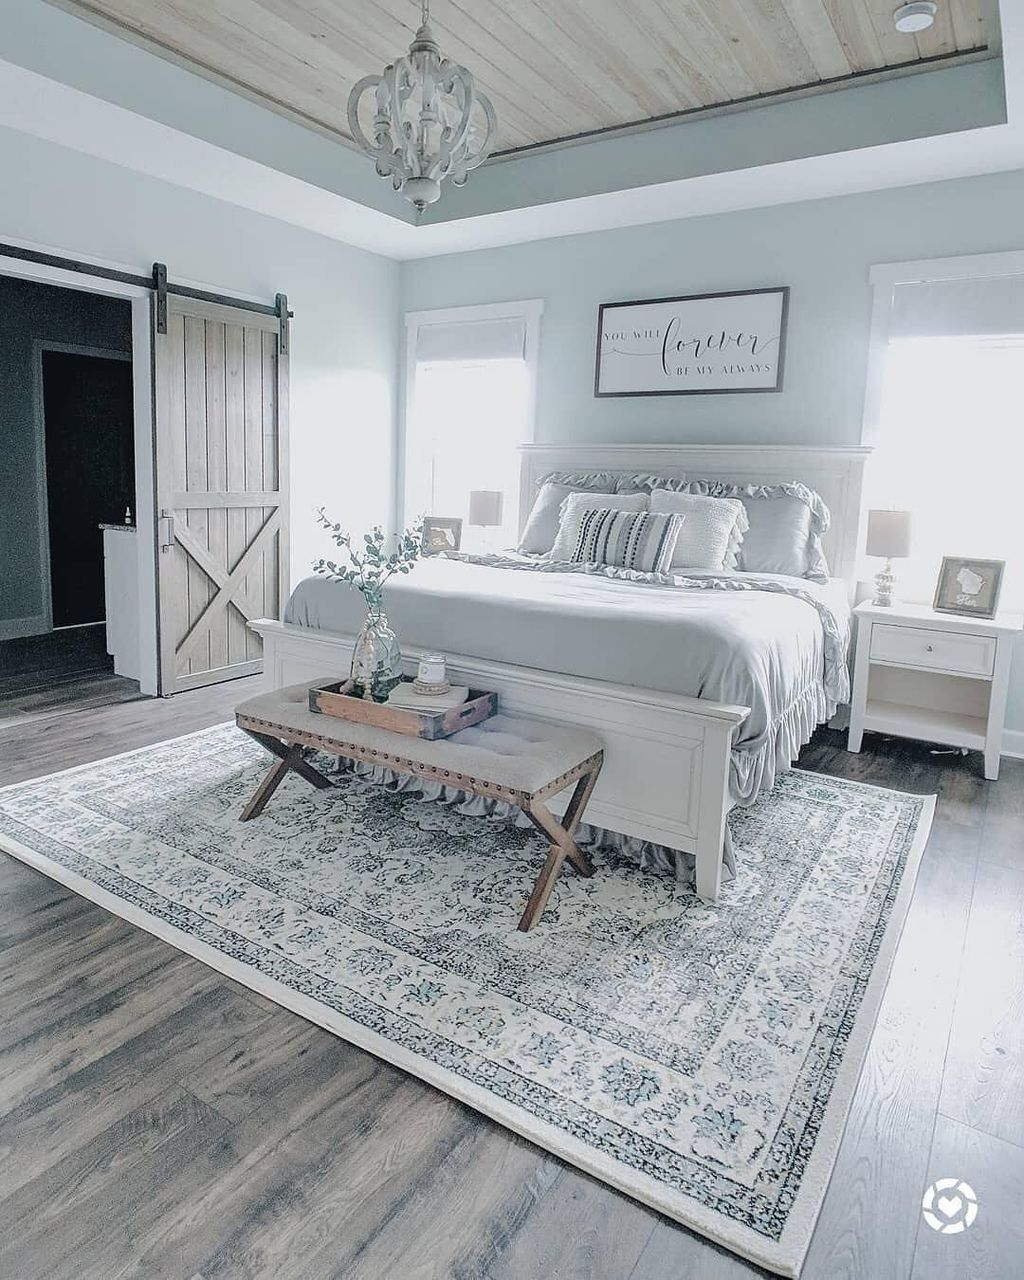 20+ Magnificient Master Bedroom Decorating Ideas images